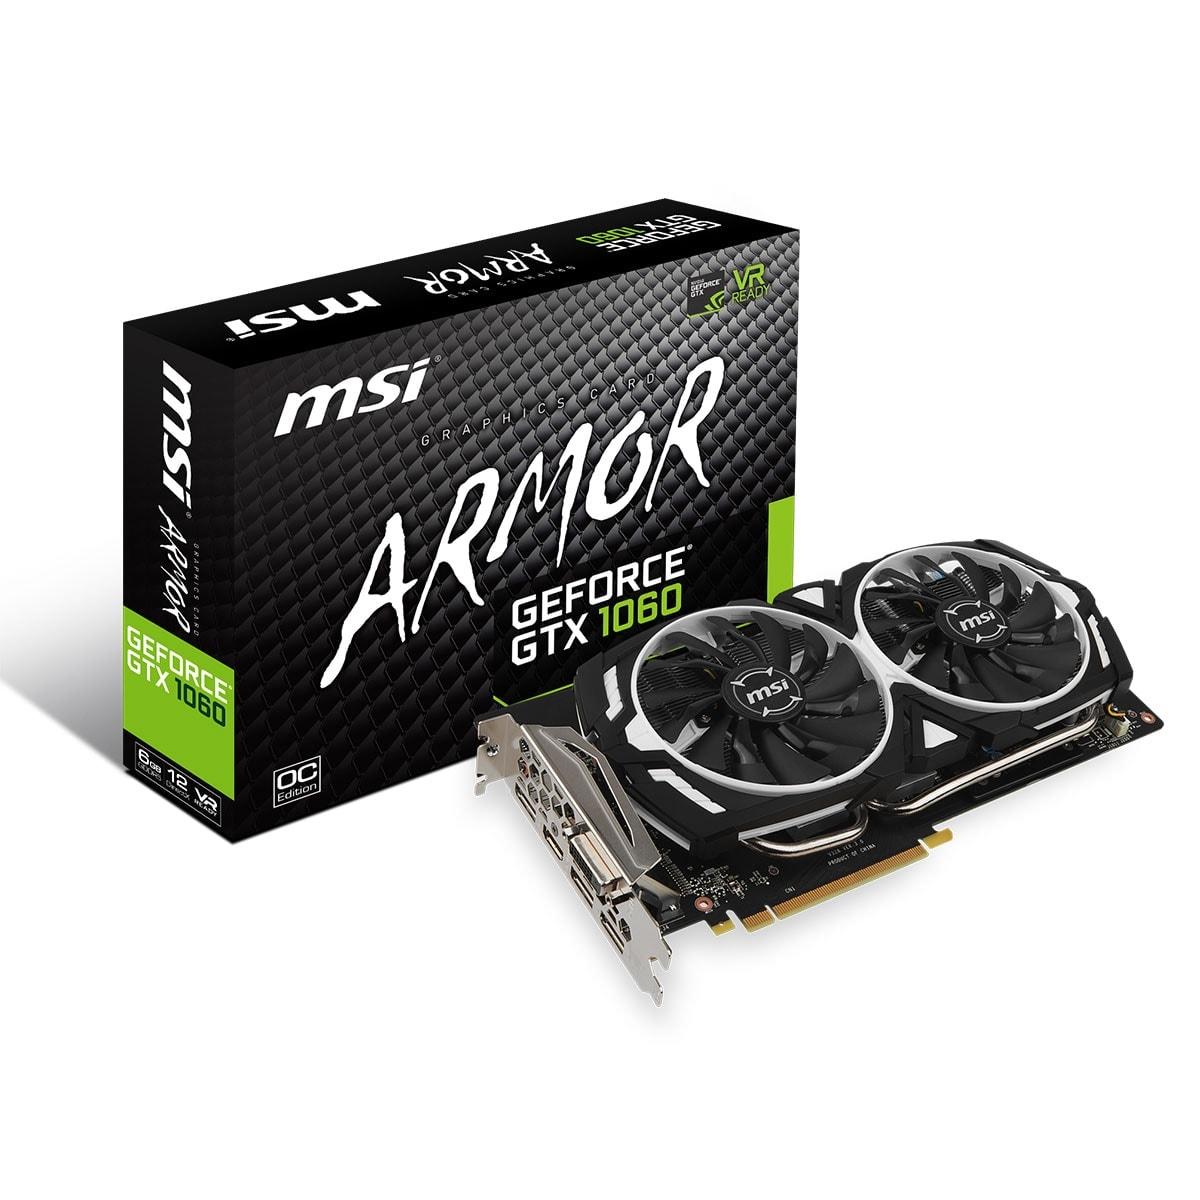 MSI GeForce GTX 1060 ARMOR 6G OC  (GTX 1060 ARMOR 6G OC --) - Achat / Vente Carte Graphique sur Cybertek.fr - 0